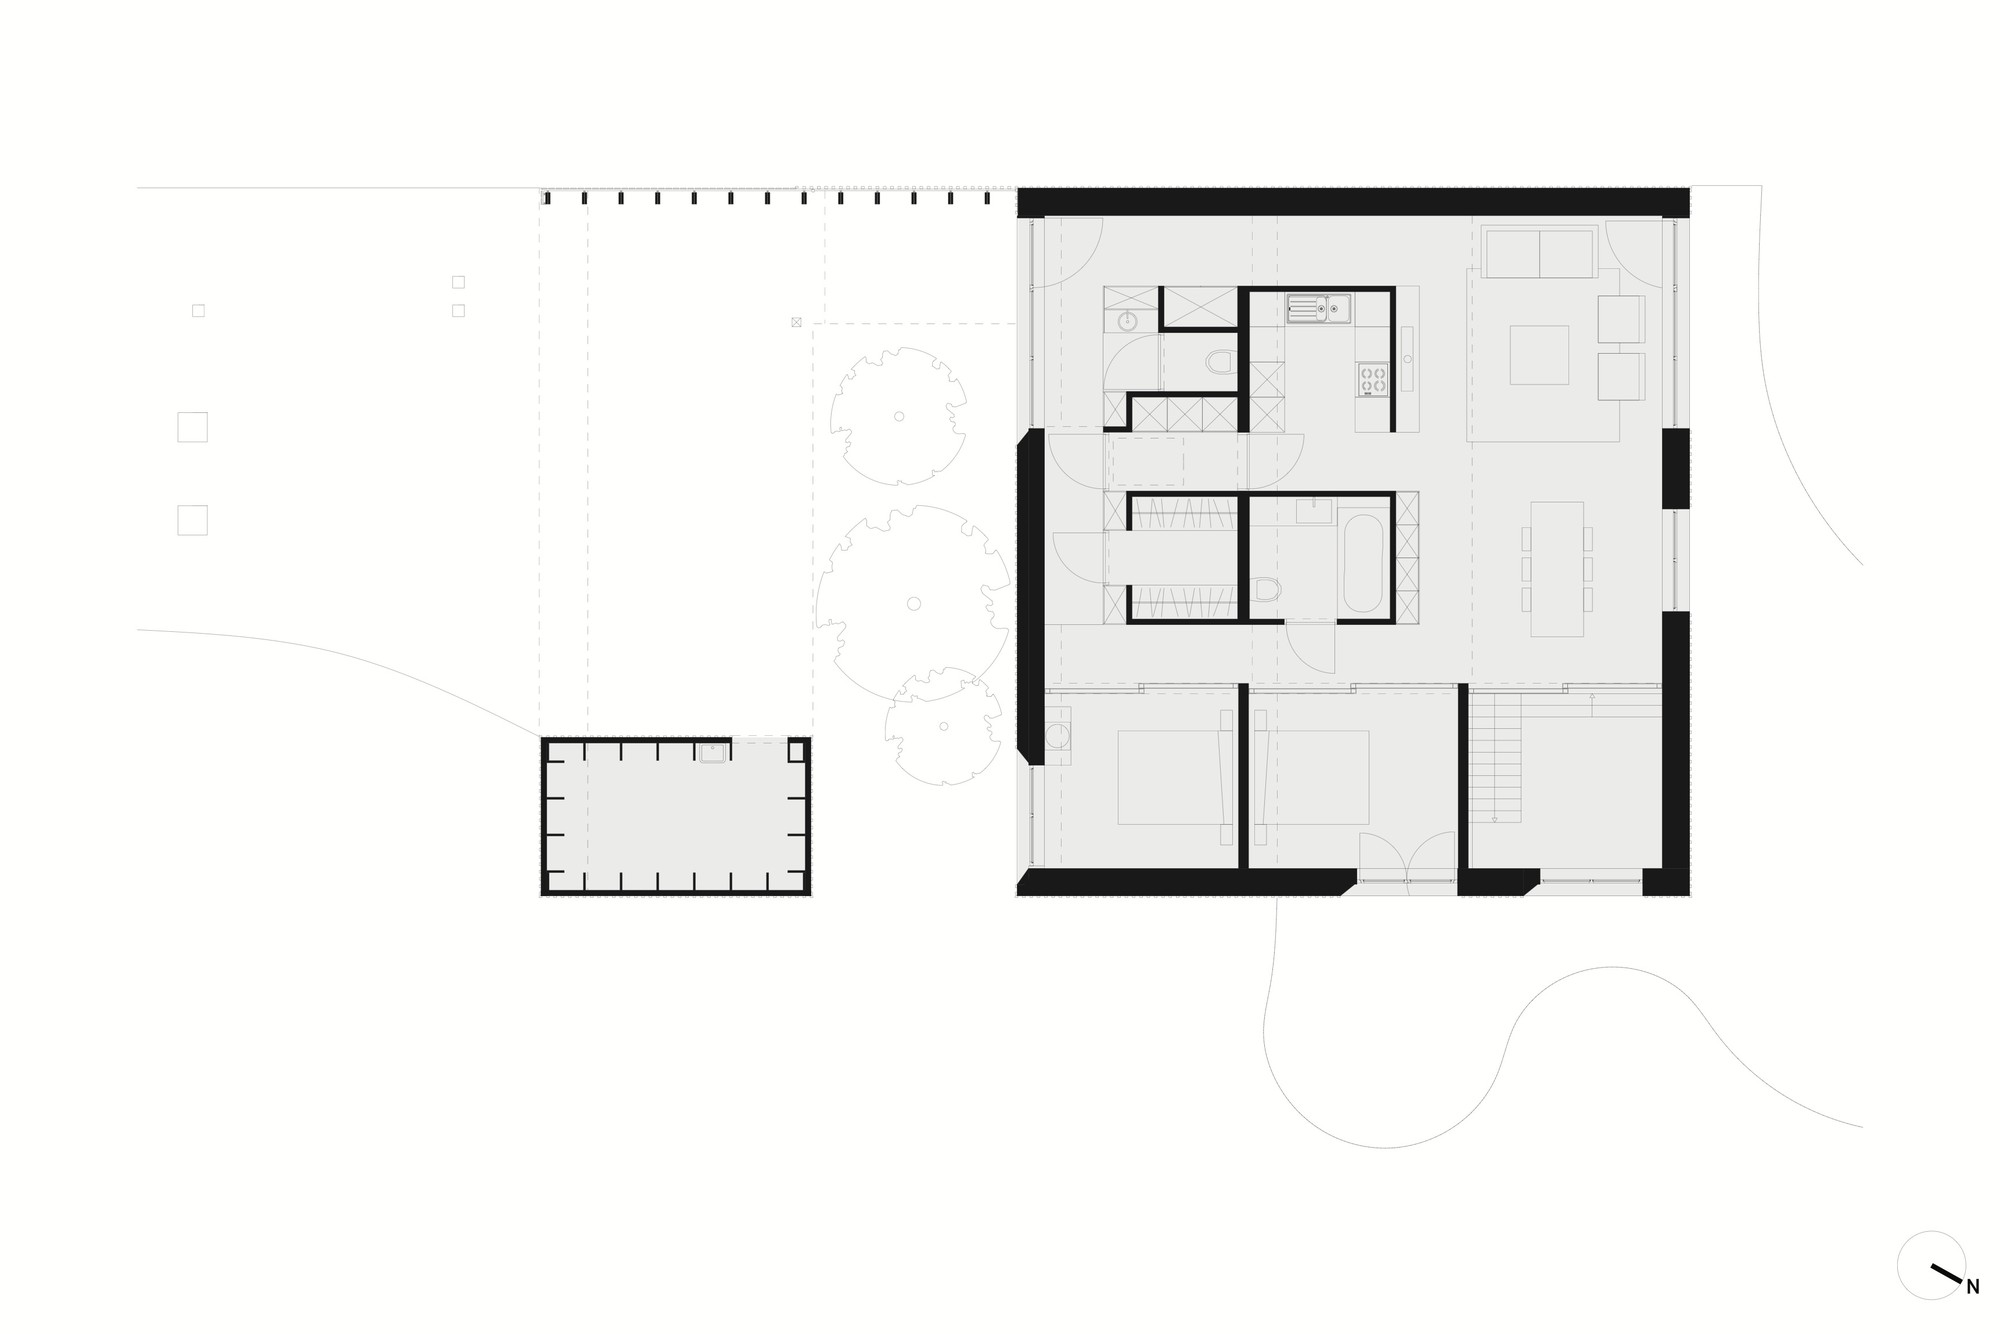 gallery of gran - passive house skatchkoff    hub